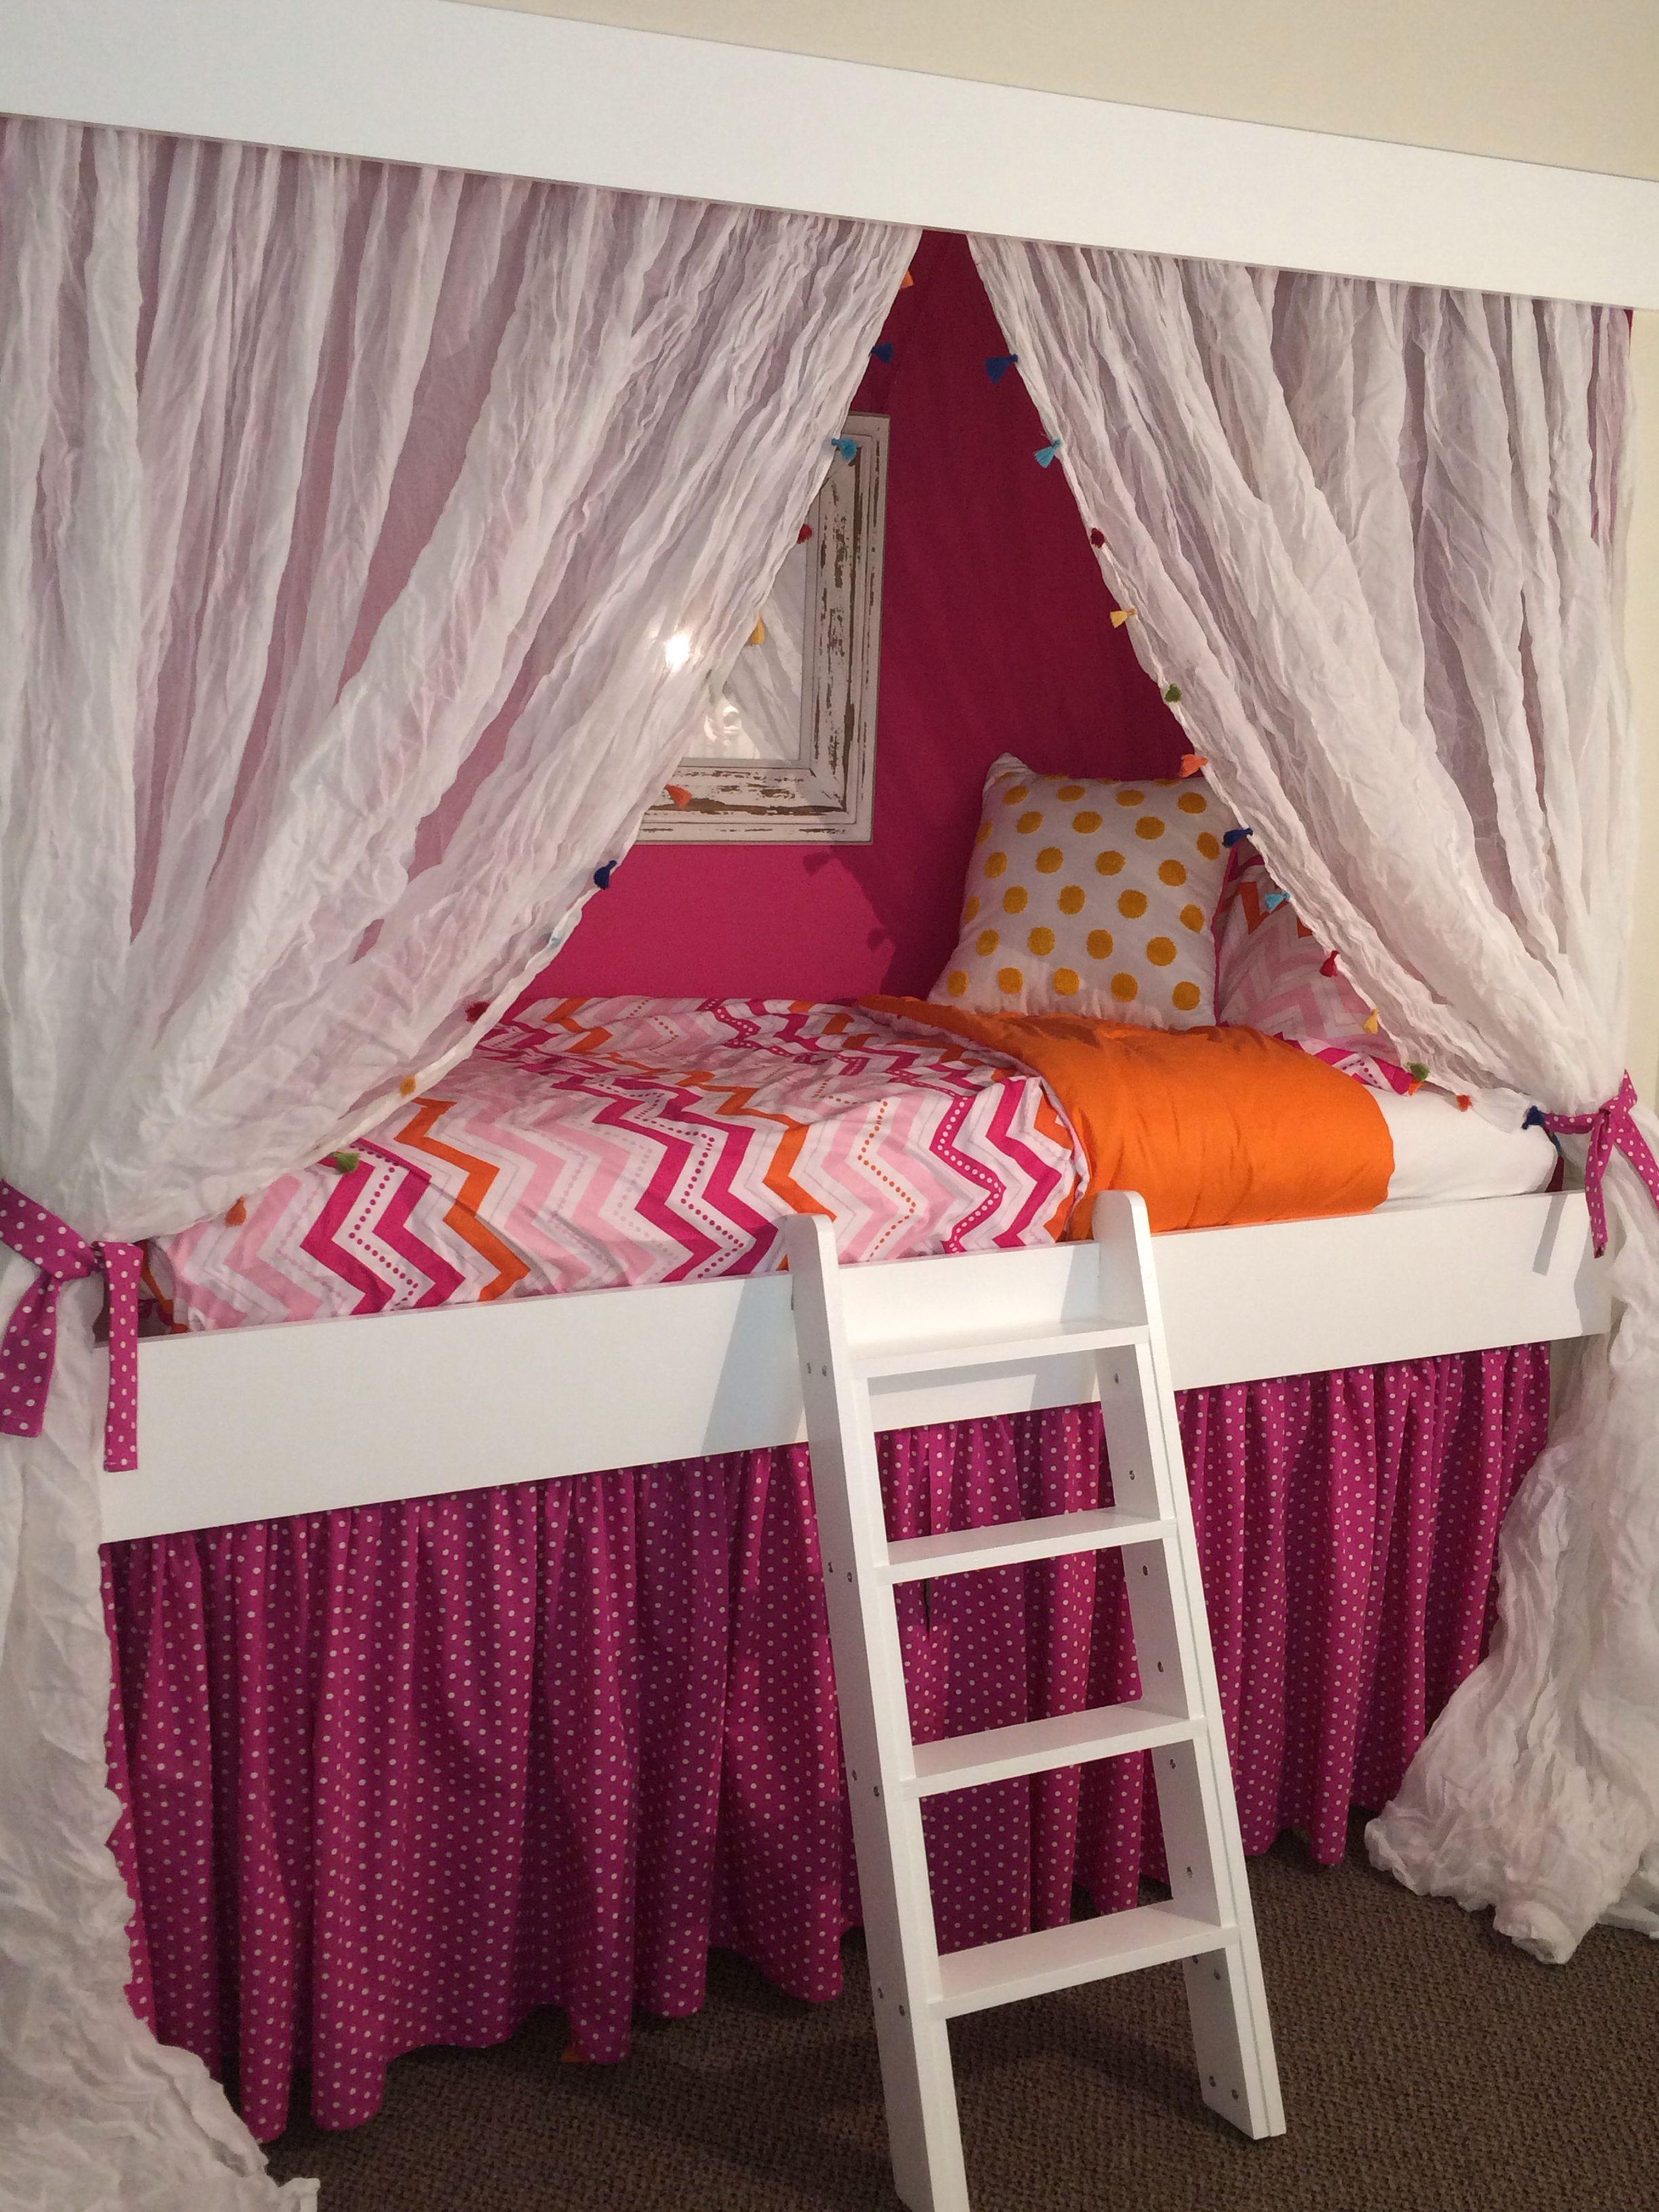 Girls Loft Bed Built Into Closet With Storage Underneath